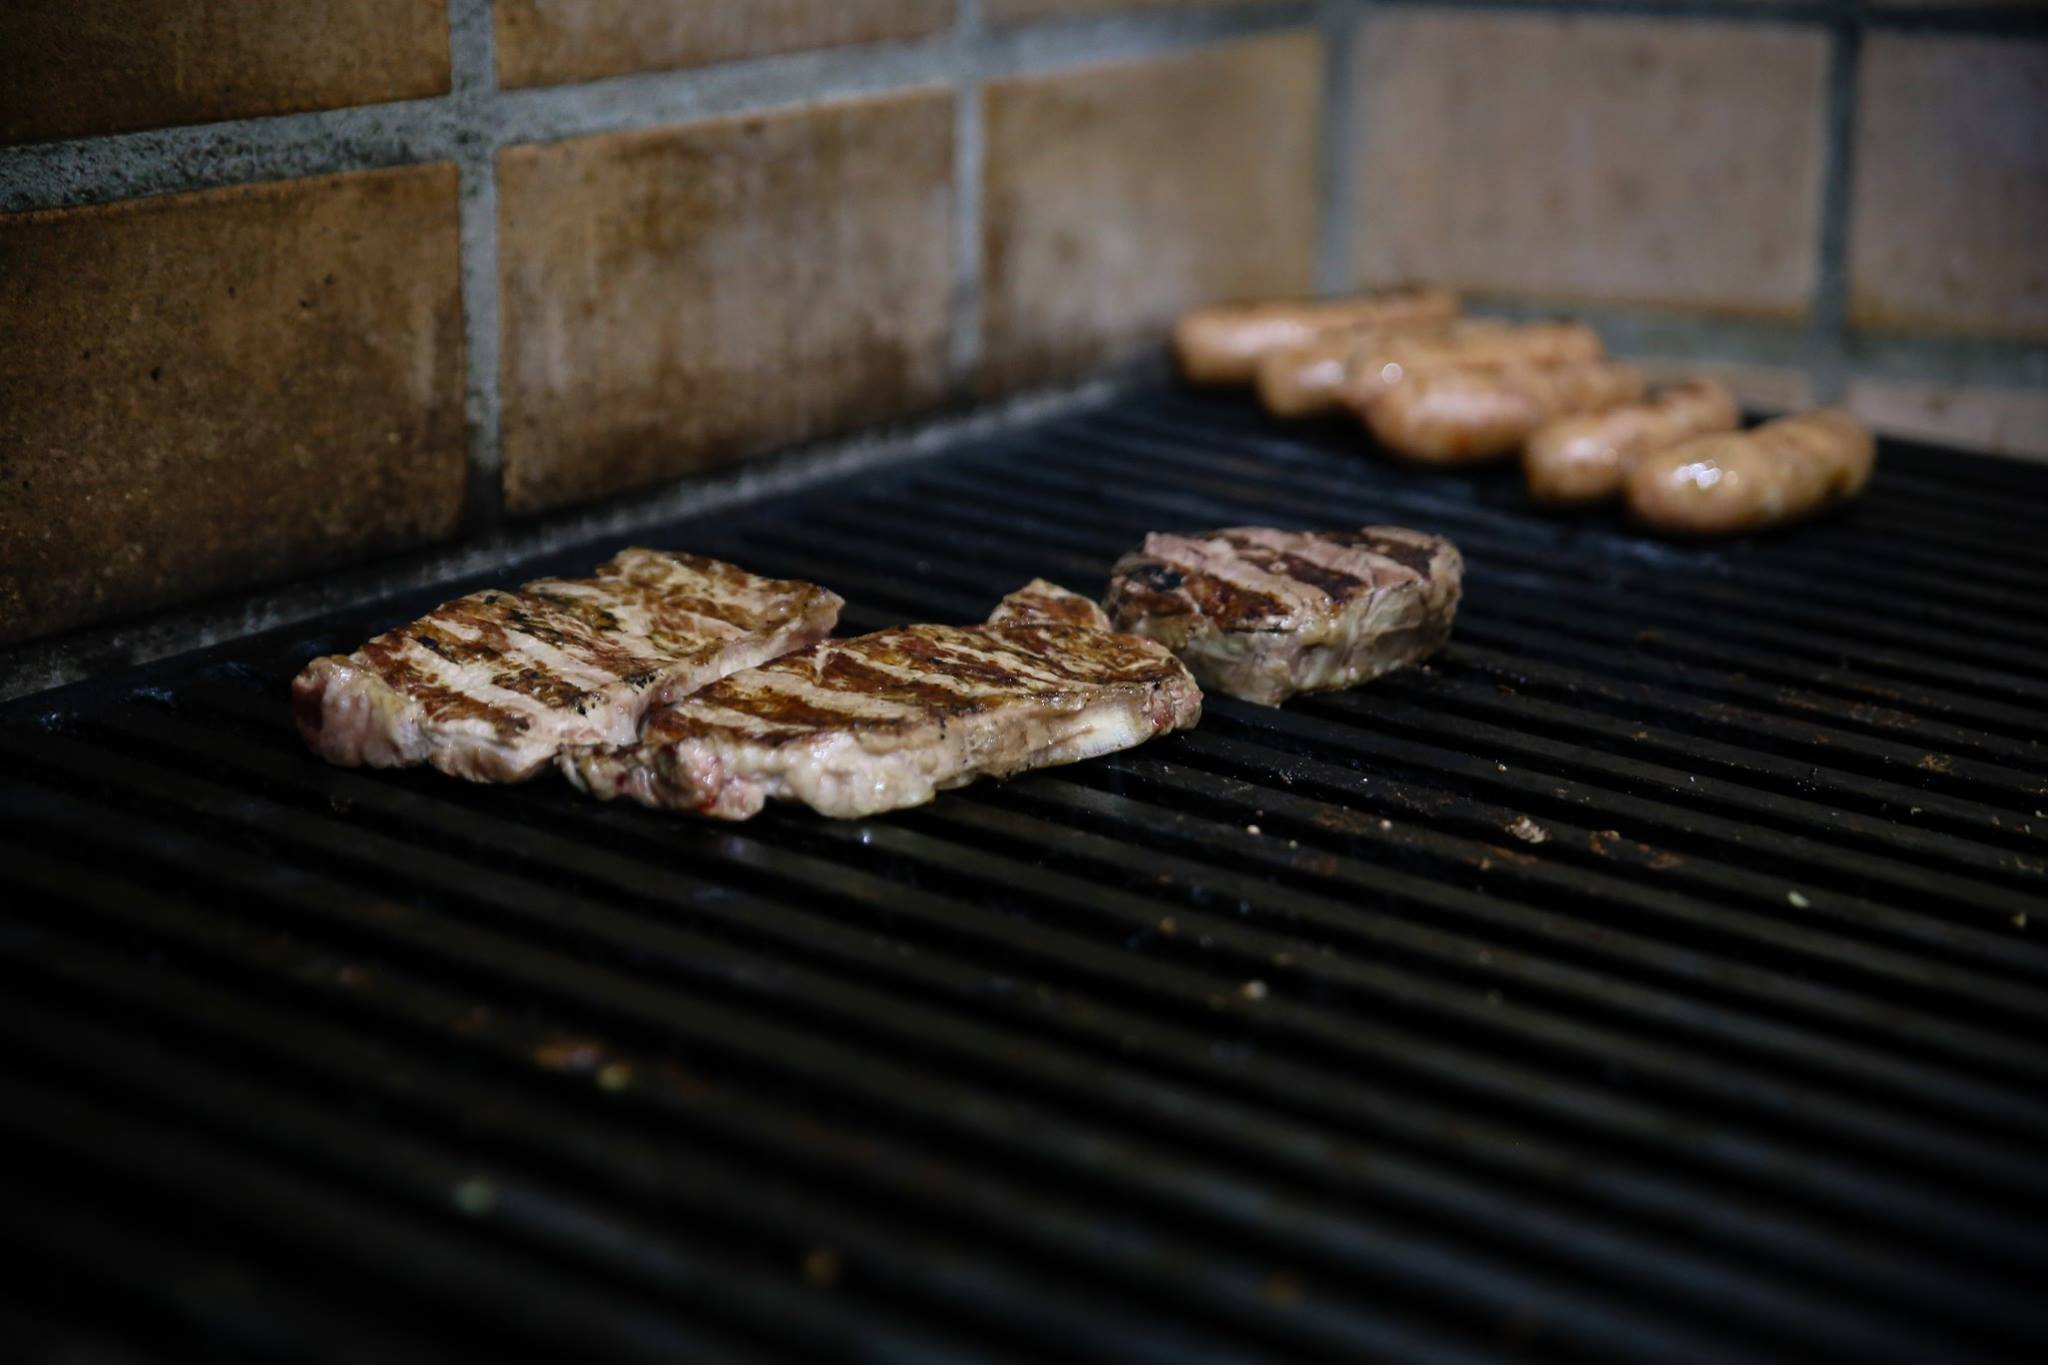 Carne Brasas Tasca Ramonet Denia Calle Loreto